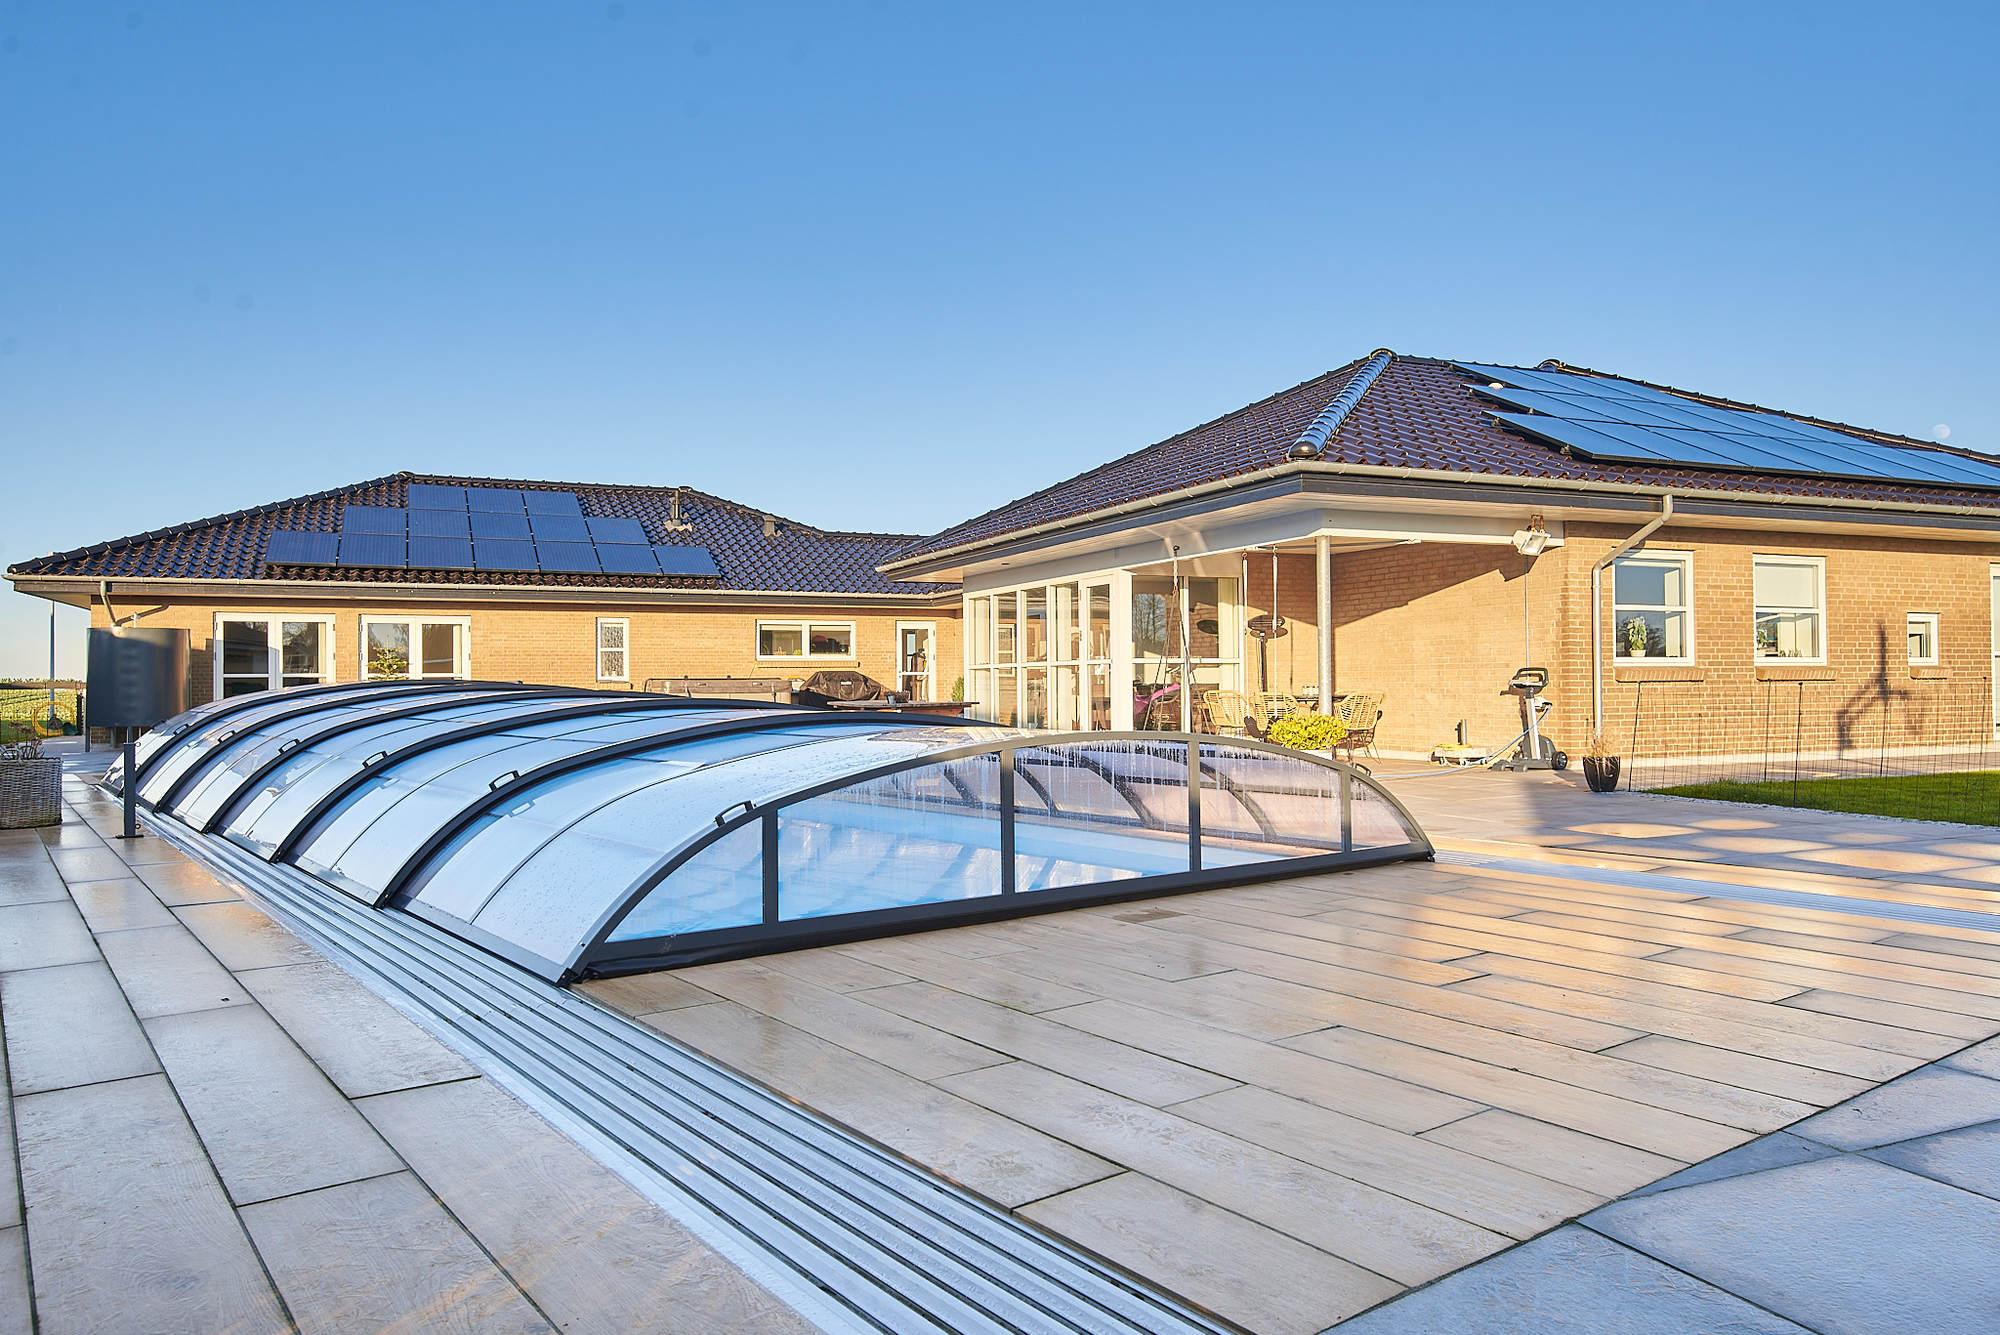 Wellmore swimmingpool